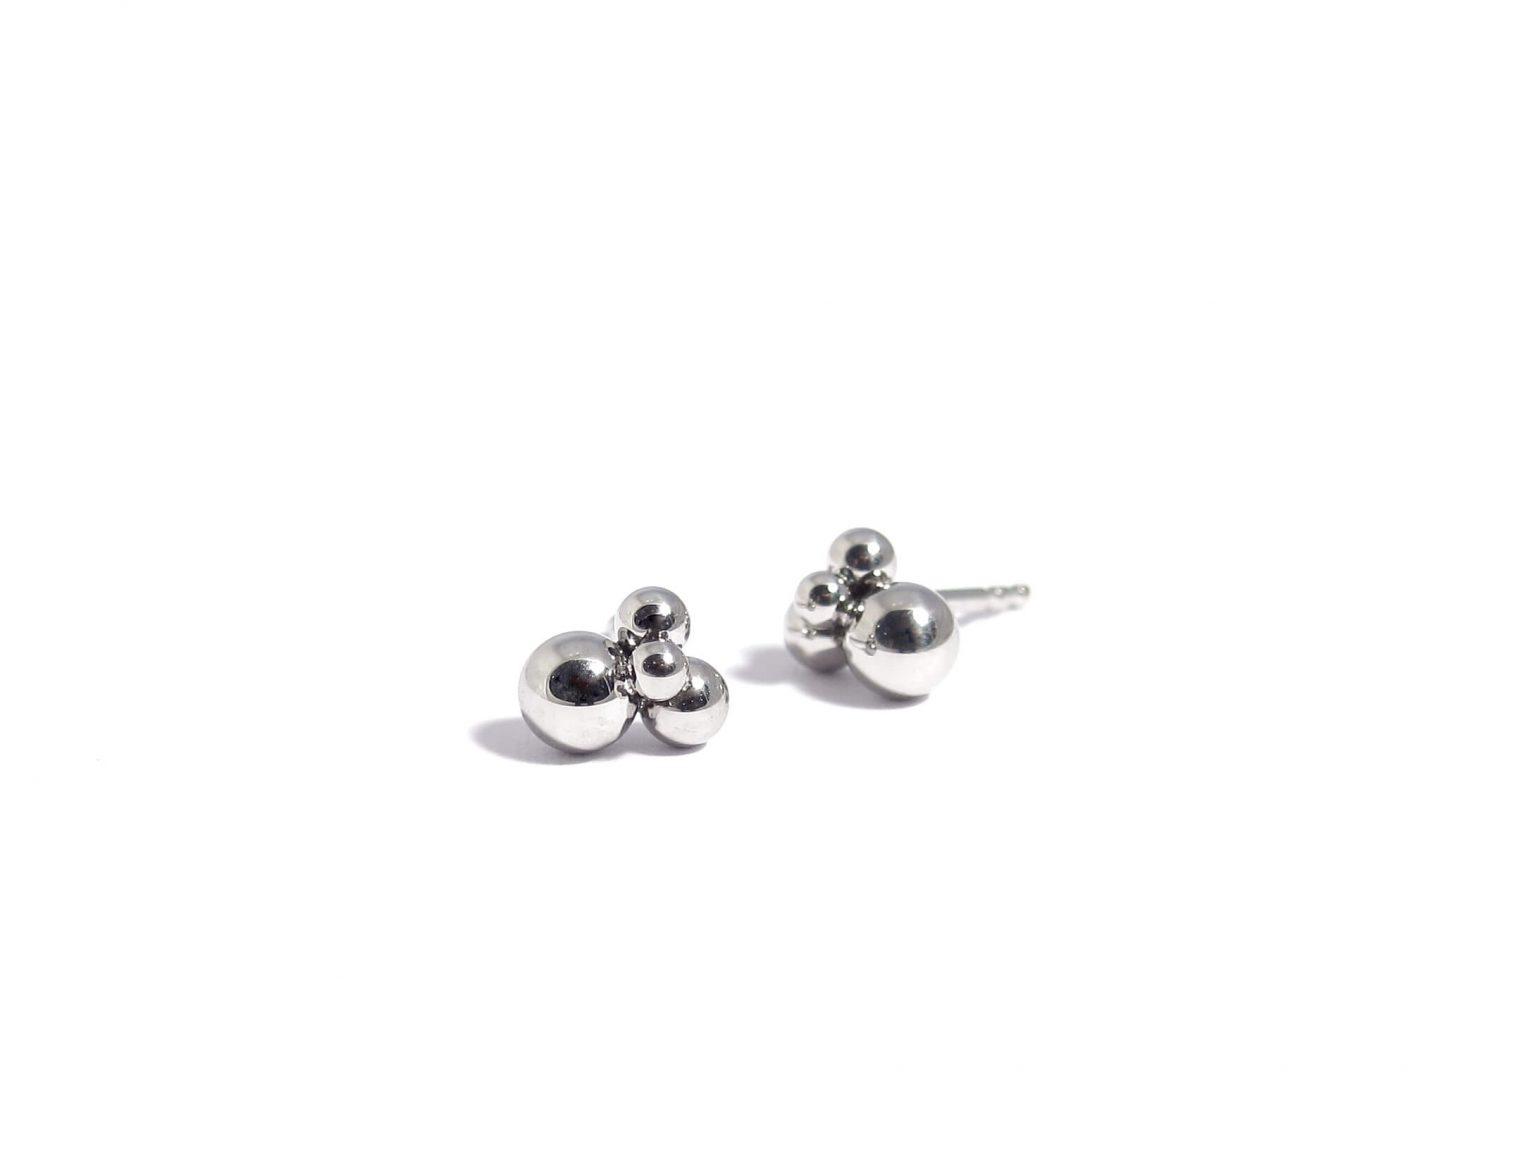 polished sphere earstuds